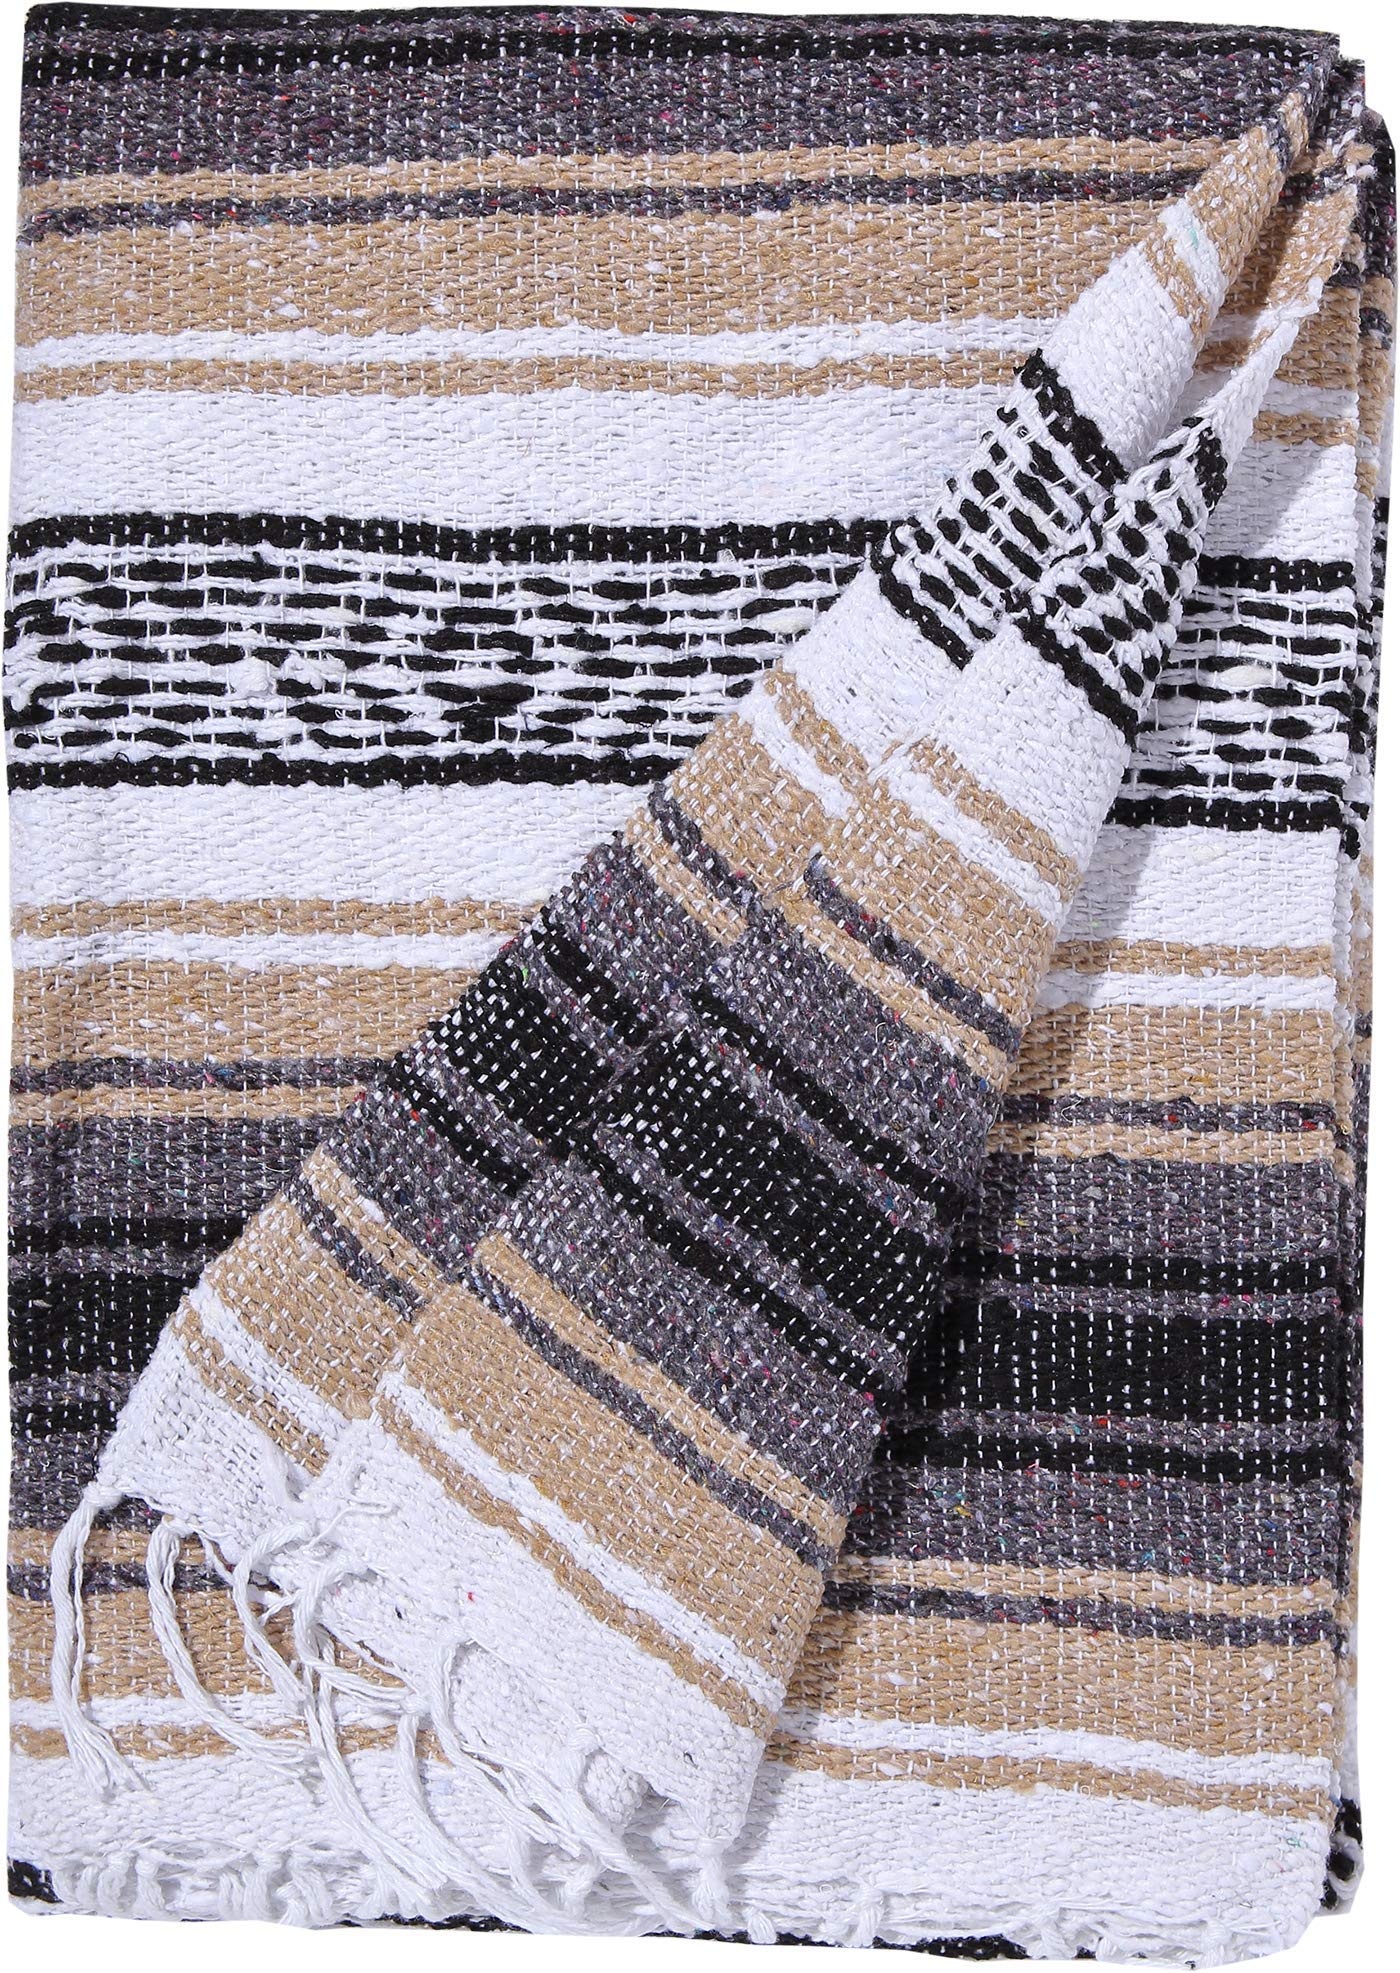 El Paso Designs Genuine Mexican Falsa Blanket - Yoga Studio Blanket, Colorful, Soft Woven Serape Imported from Mexico (Beige) by El Paso Designs (Image #2)